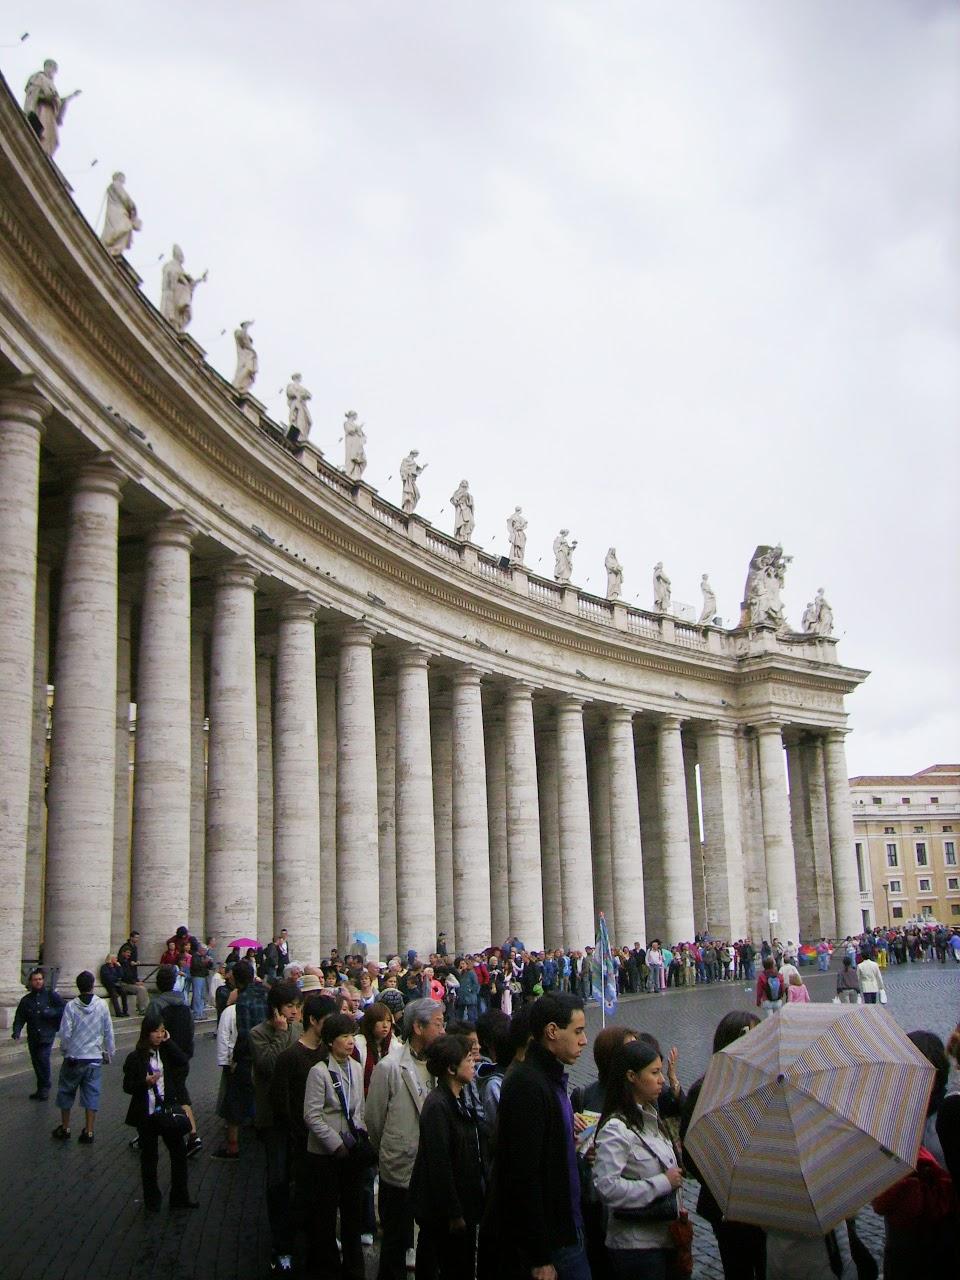 Rome St Peter's Basilica Rooma Pietarinkirkko